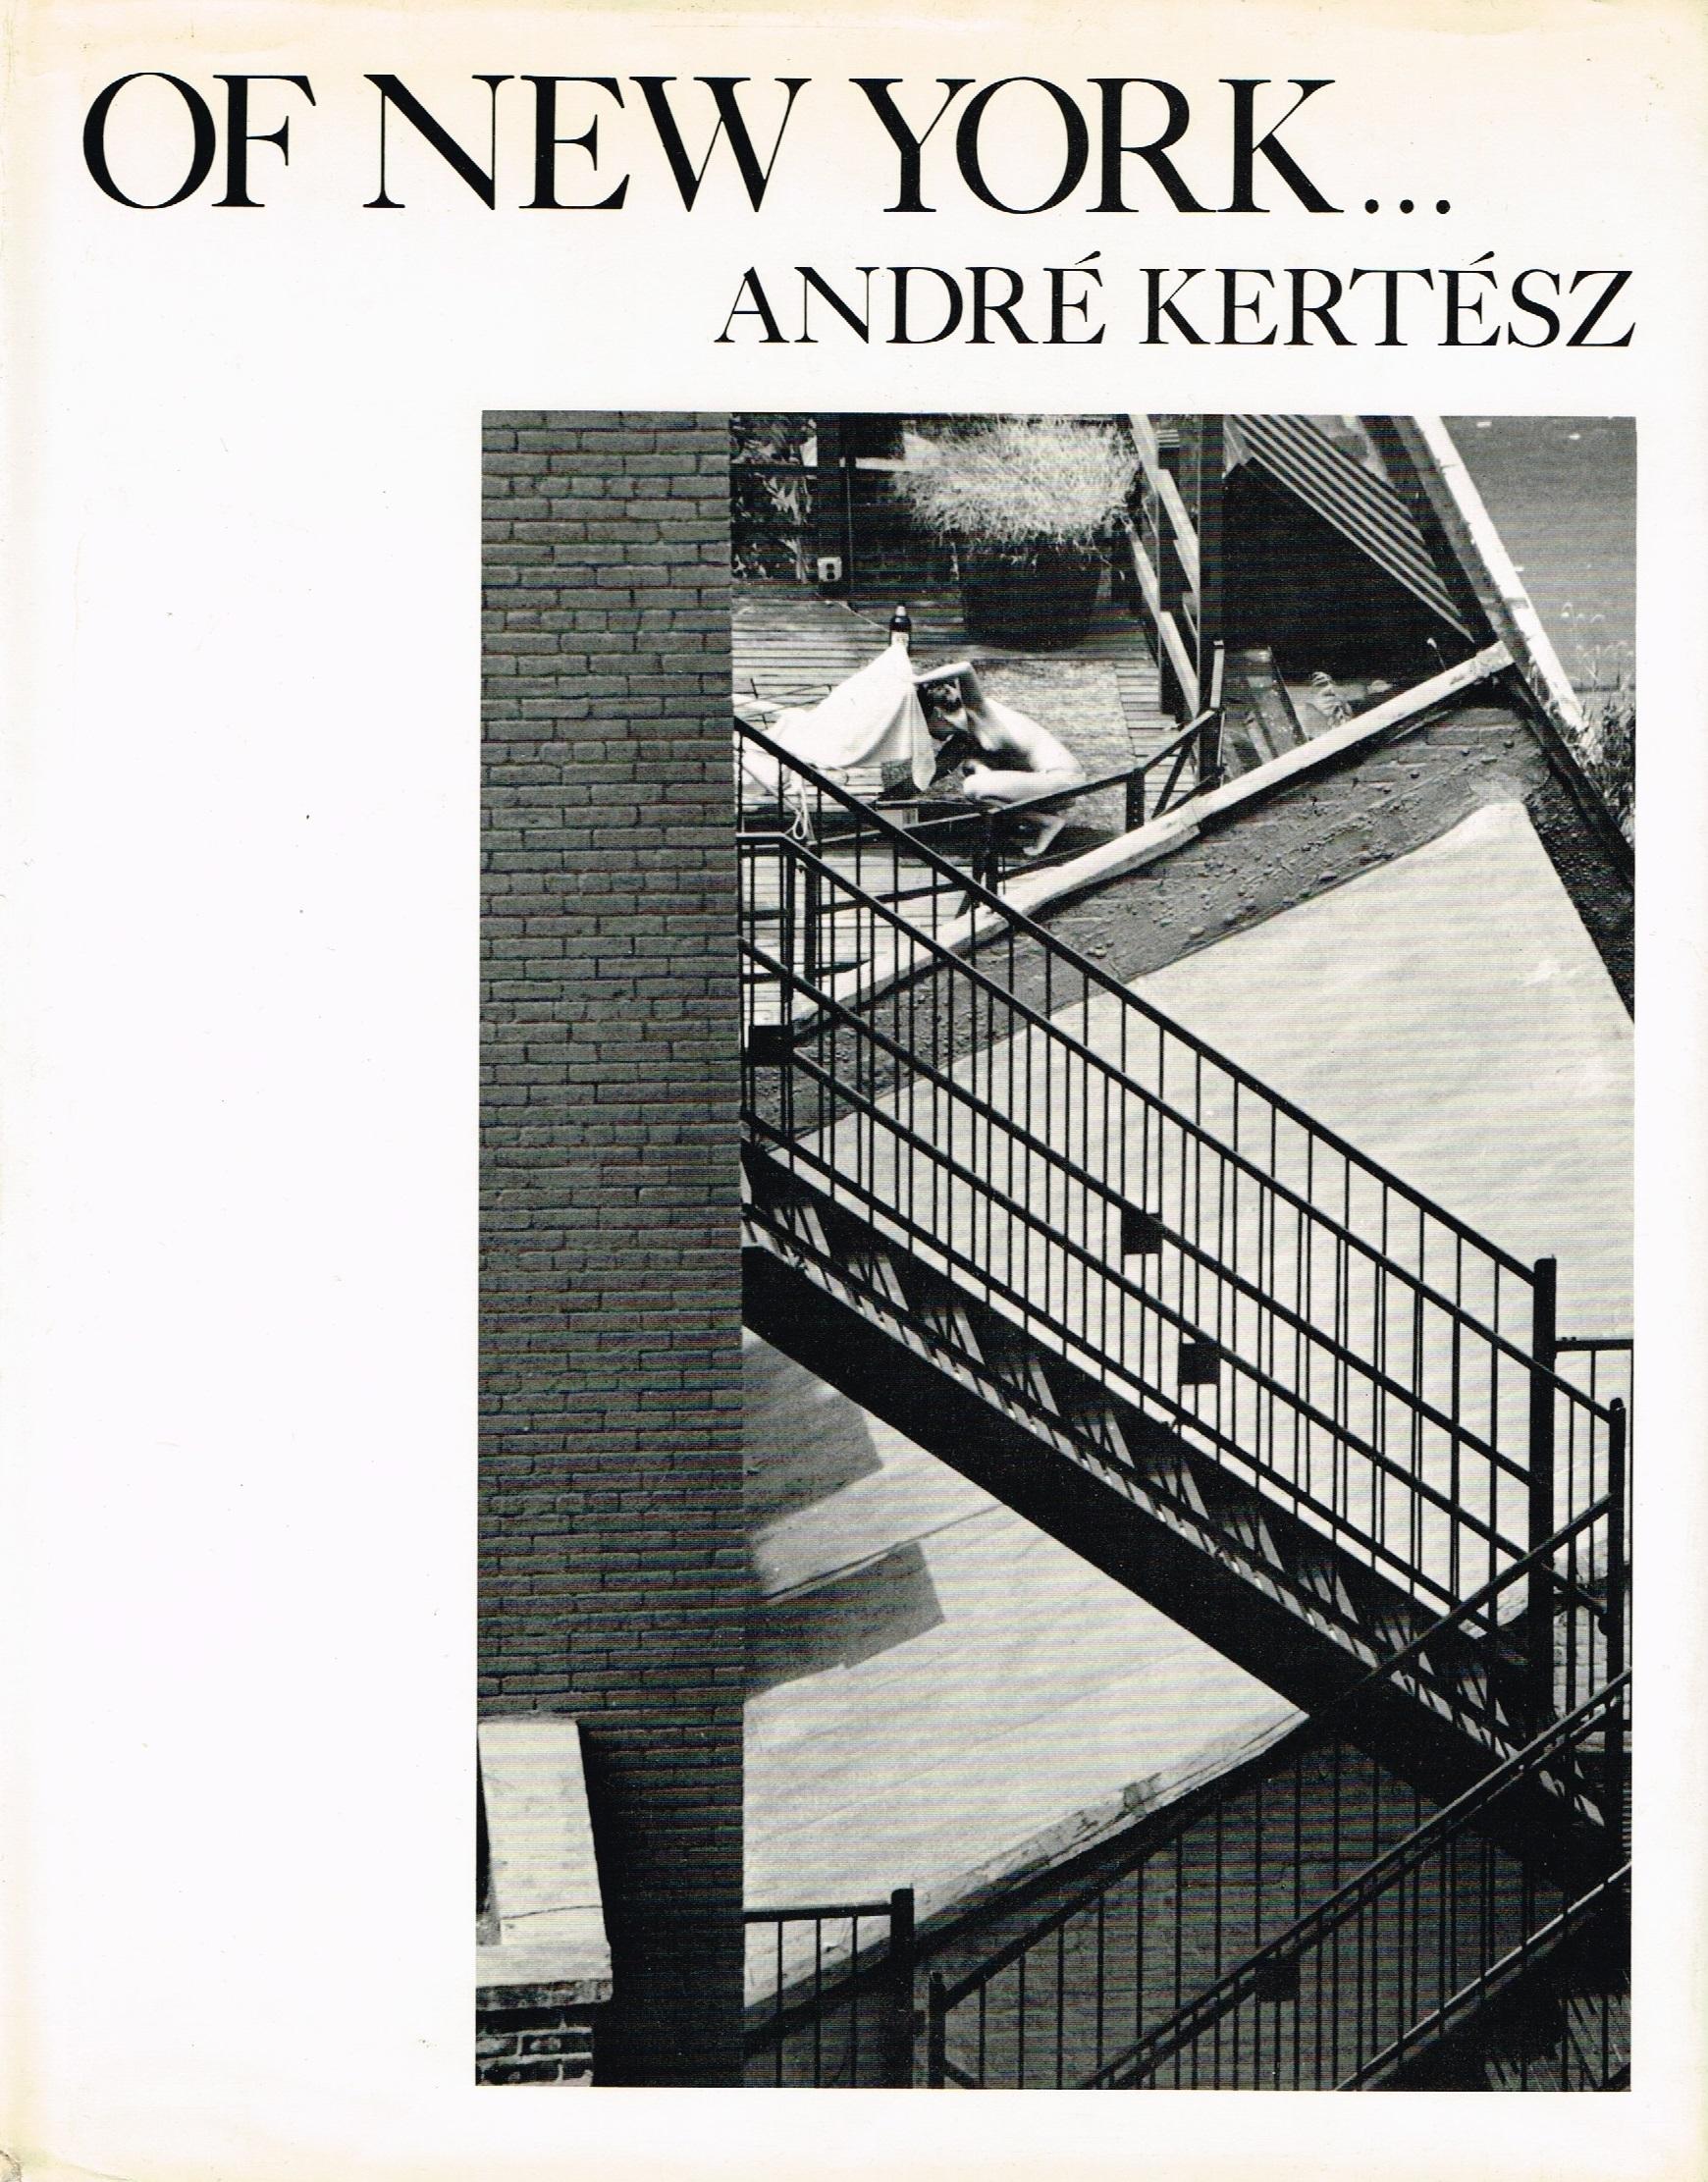 (KERTESZ, ANDRE). KERTESZ, ANDRE. NICOLE DUCROT, EDITOR - ANDRE KERTESZ: OF NEW YORK... - SIGNED PRESENTATION COPY FROM THE PHOTOGRAPHER